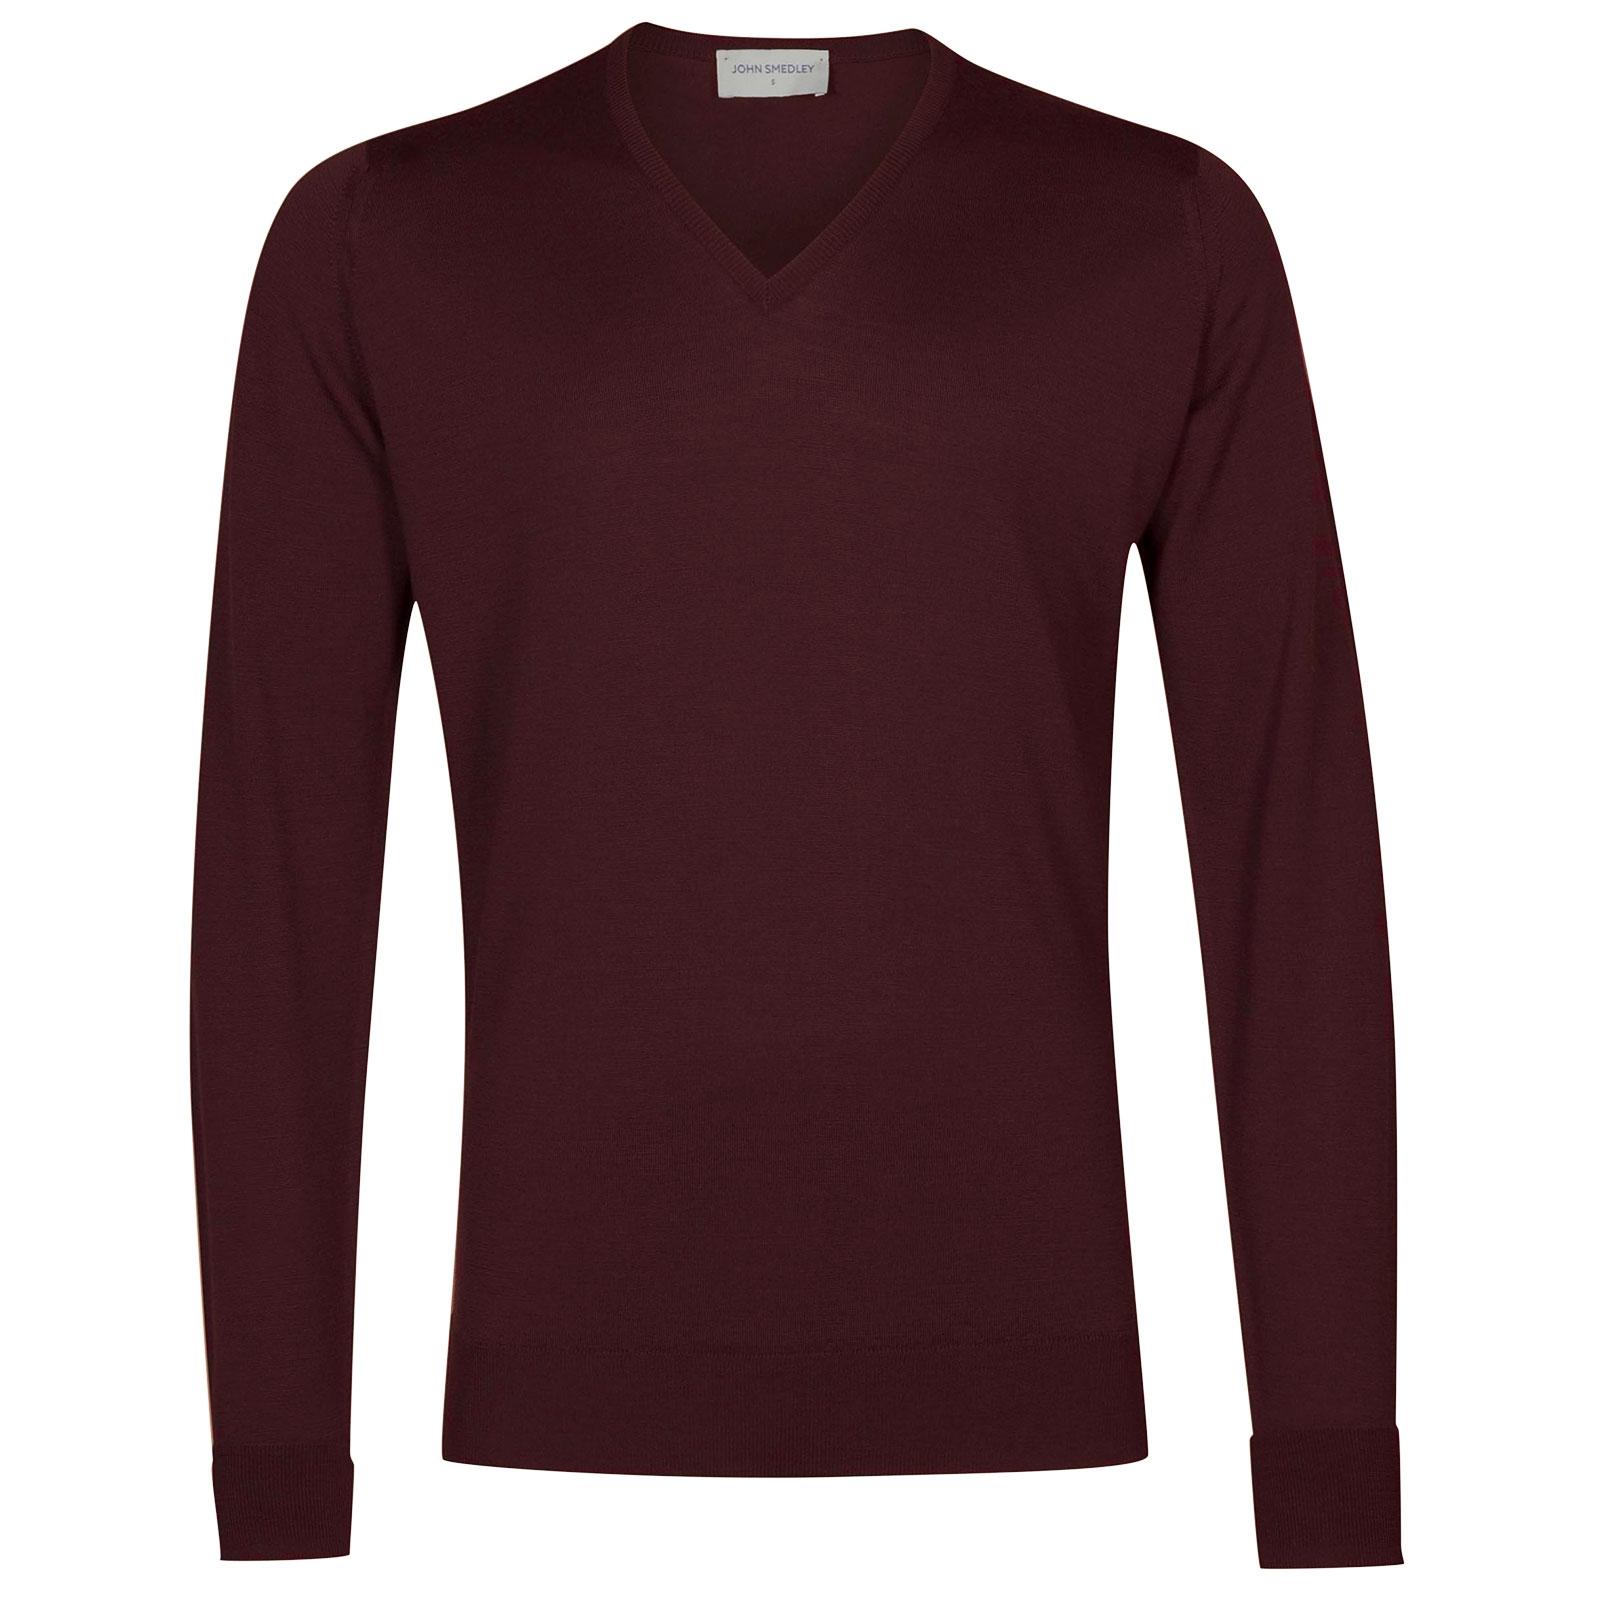 John Smedley bobby Merino Wool Pullover in Maroon Blaze-XL